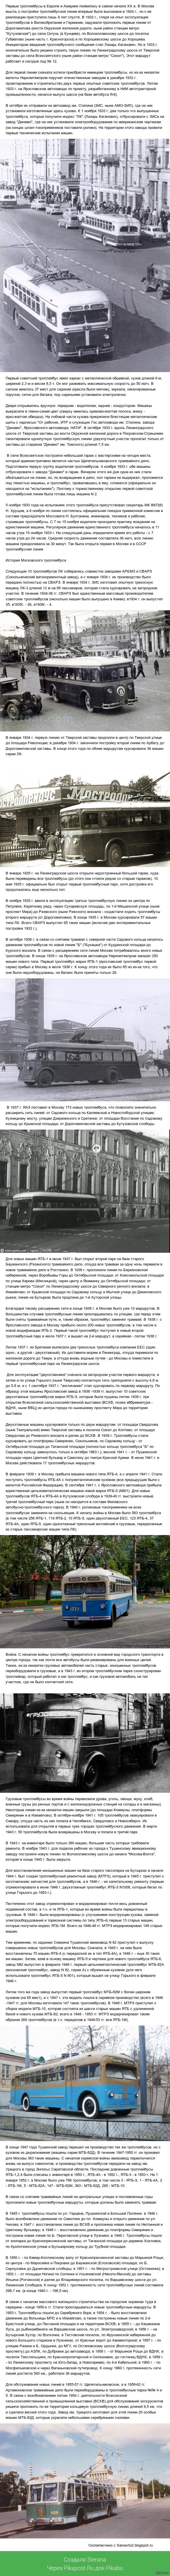 Все о троллейбусе (Часть 2)